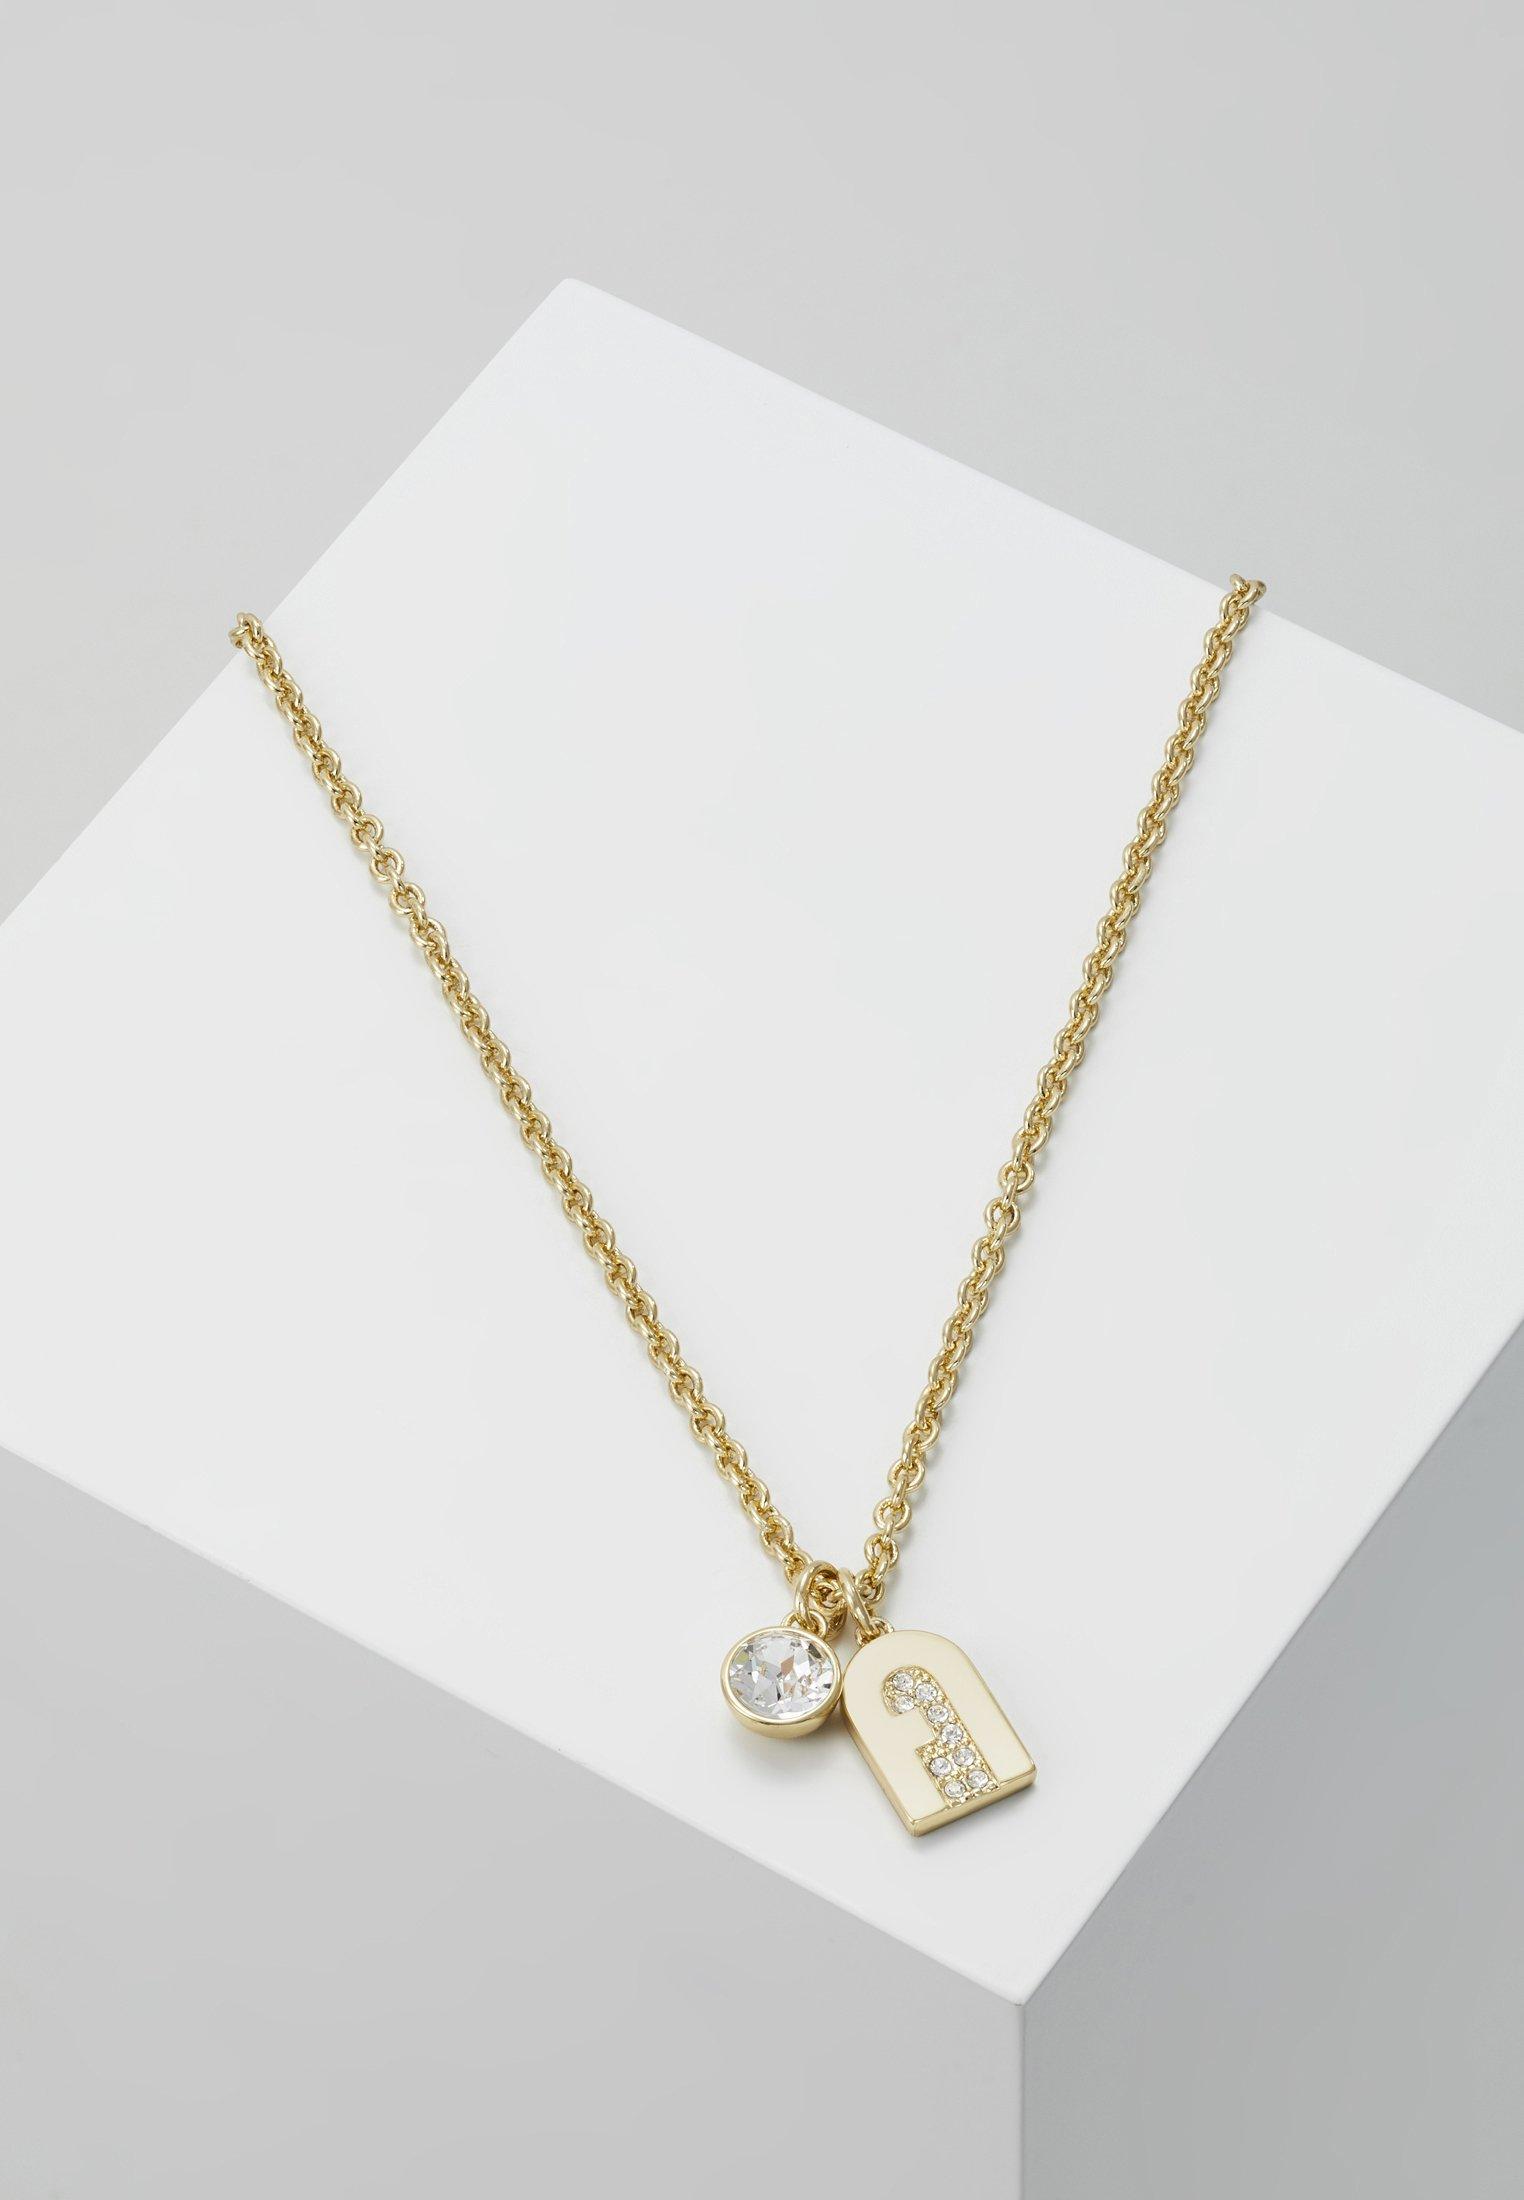 Women FURLA NEW NECKLACE - Necklace